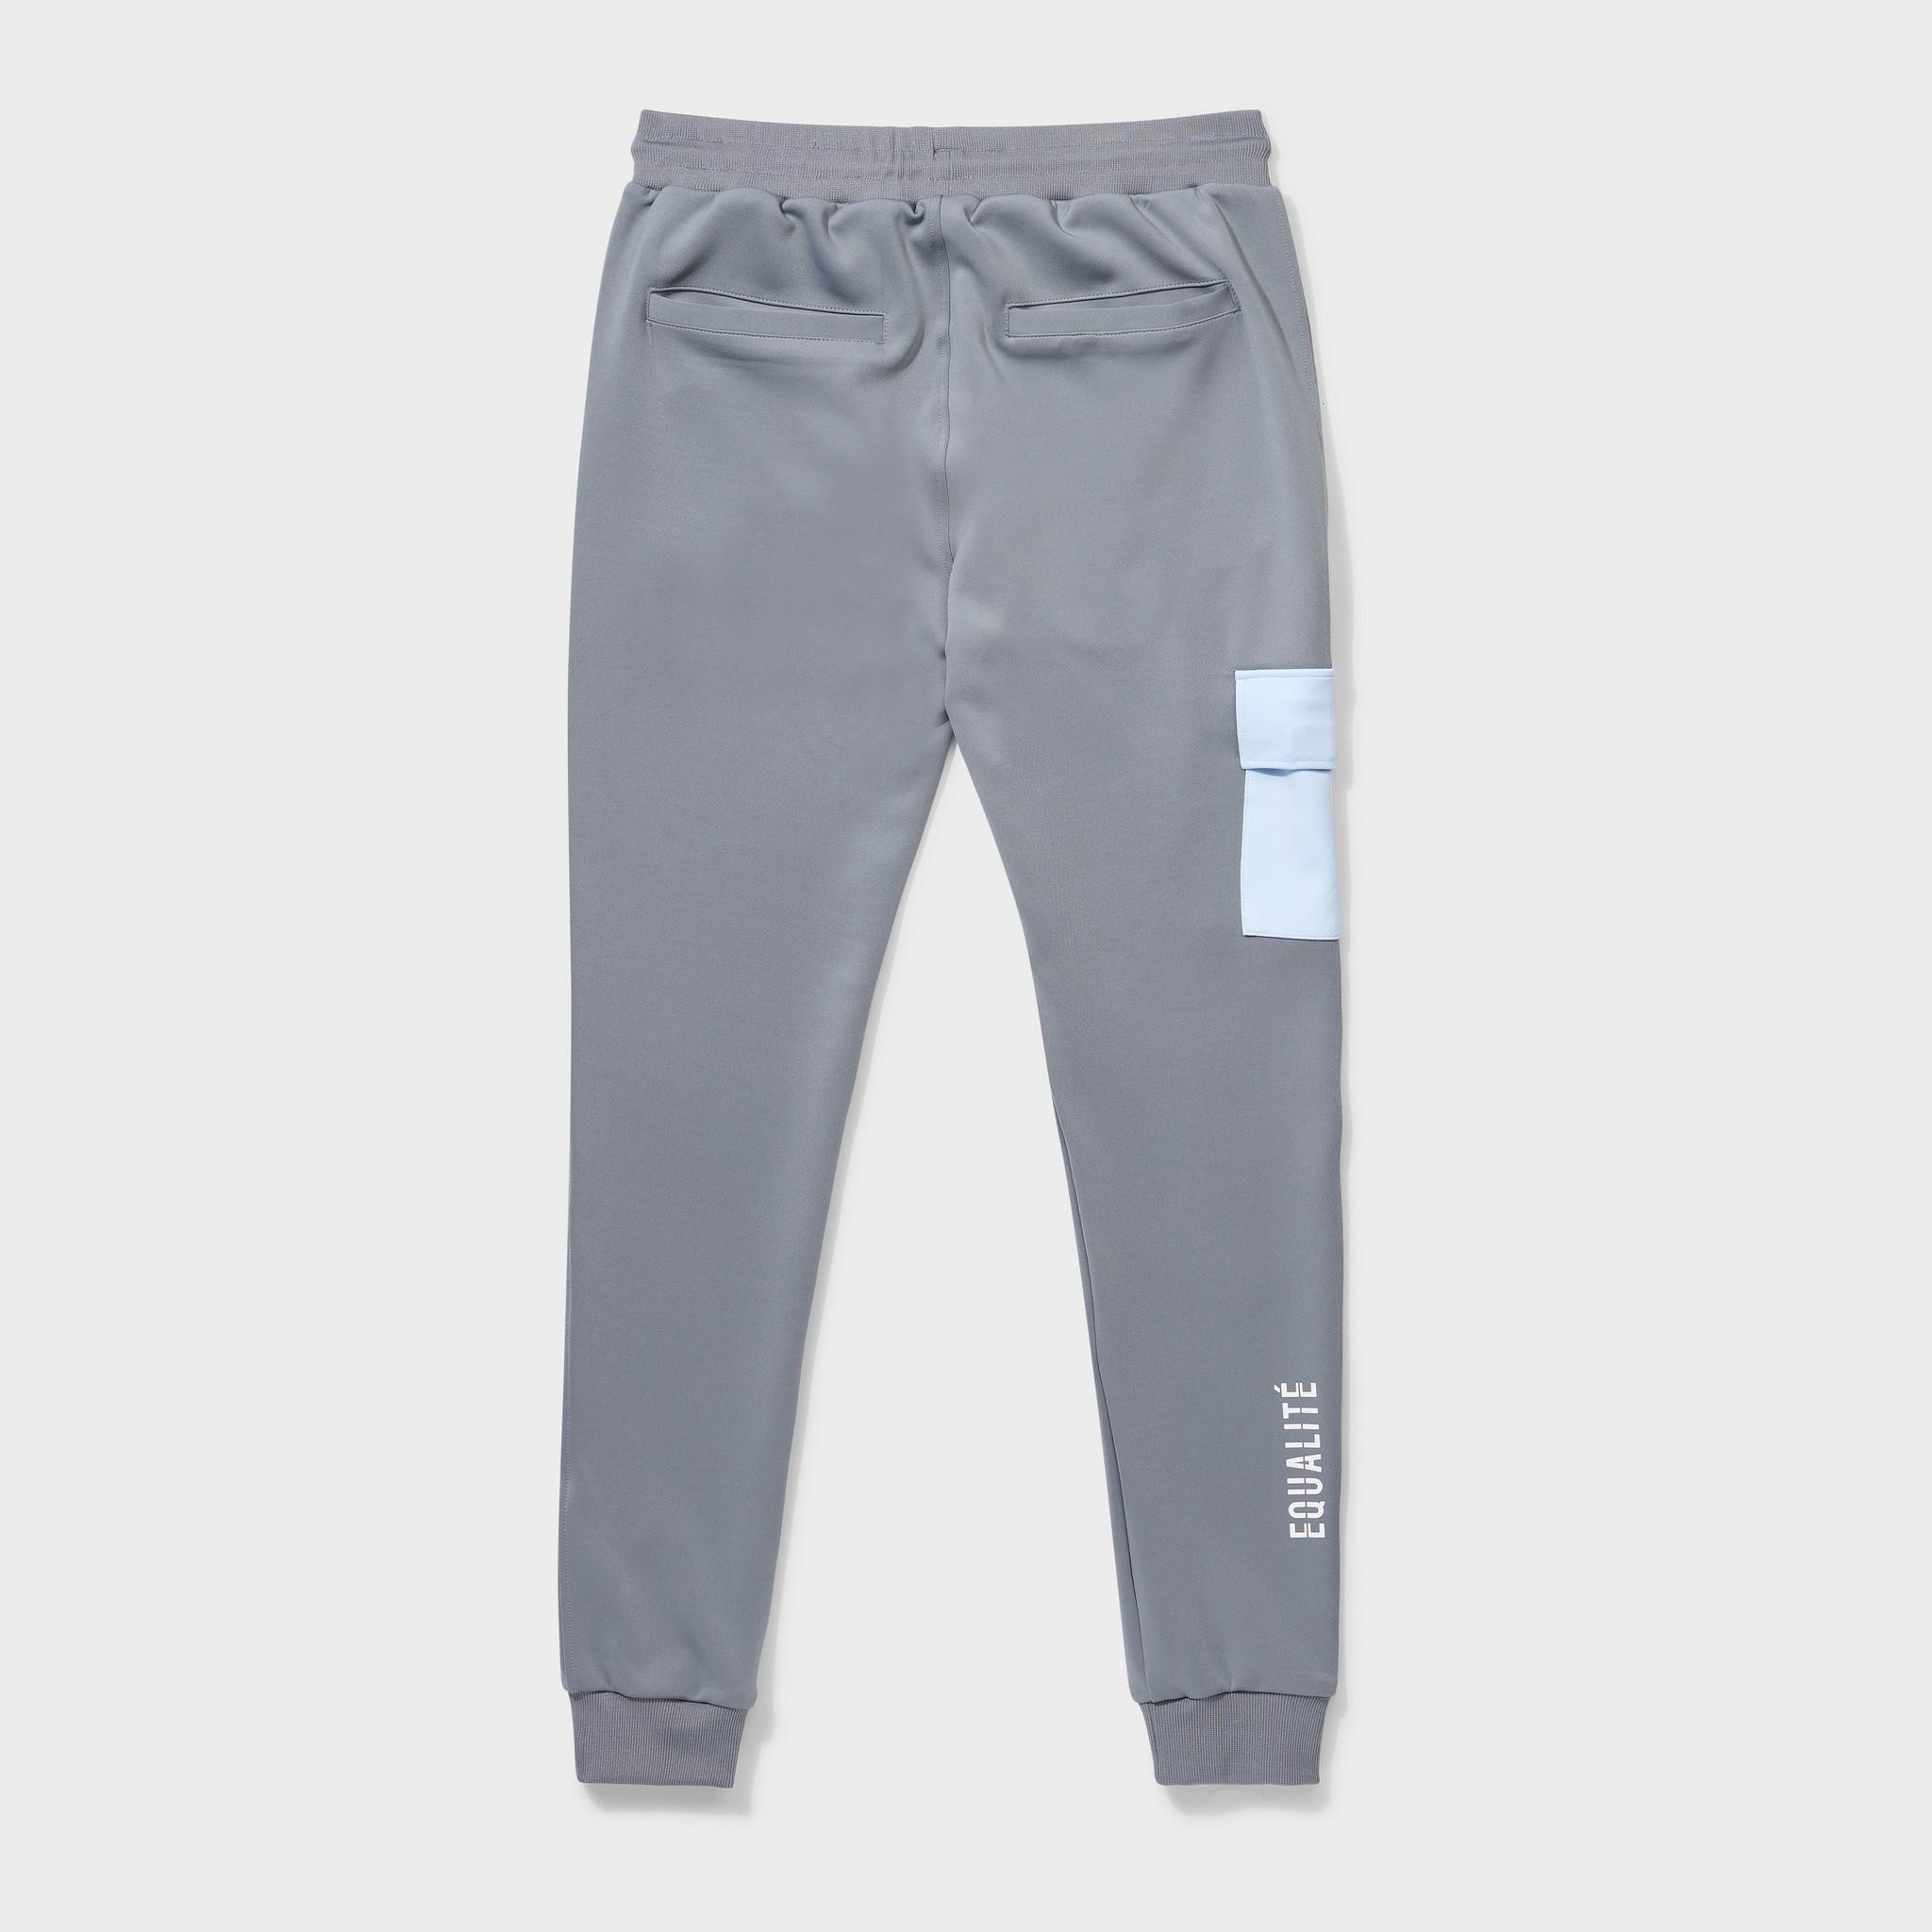 Future polyester tracksuit grey & light blue-7